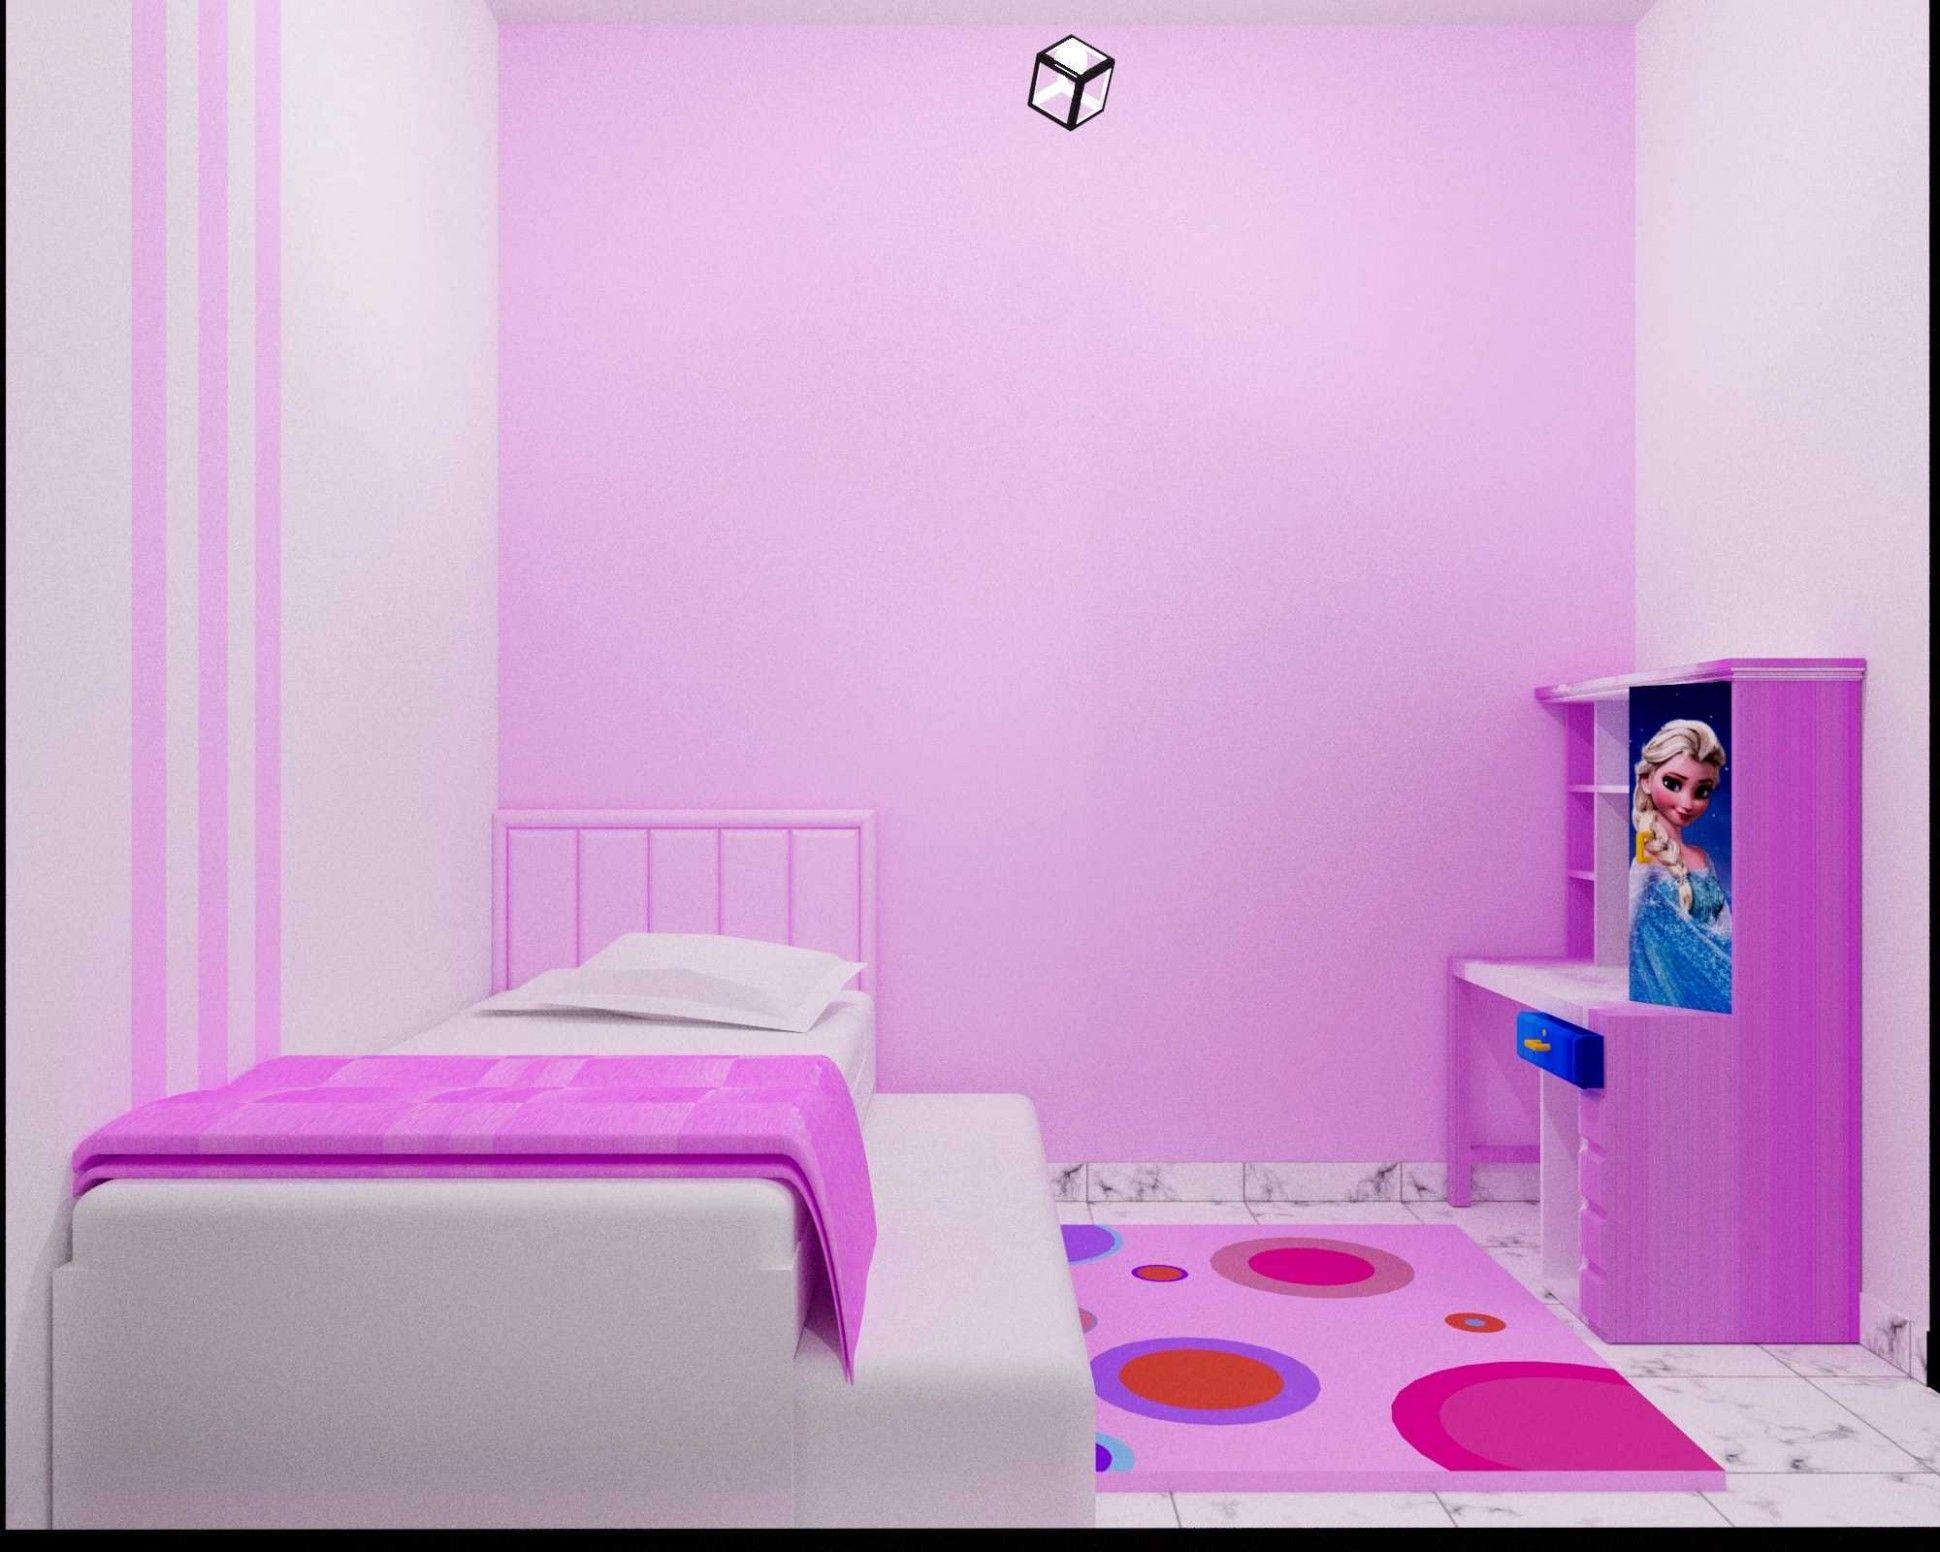 Desain Kamar Tidur Pink Ungu Cek Bahan Bangunan